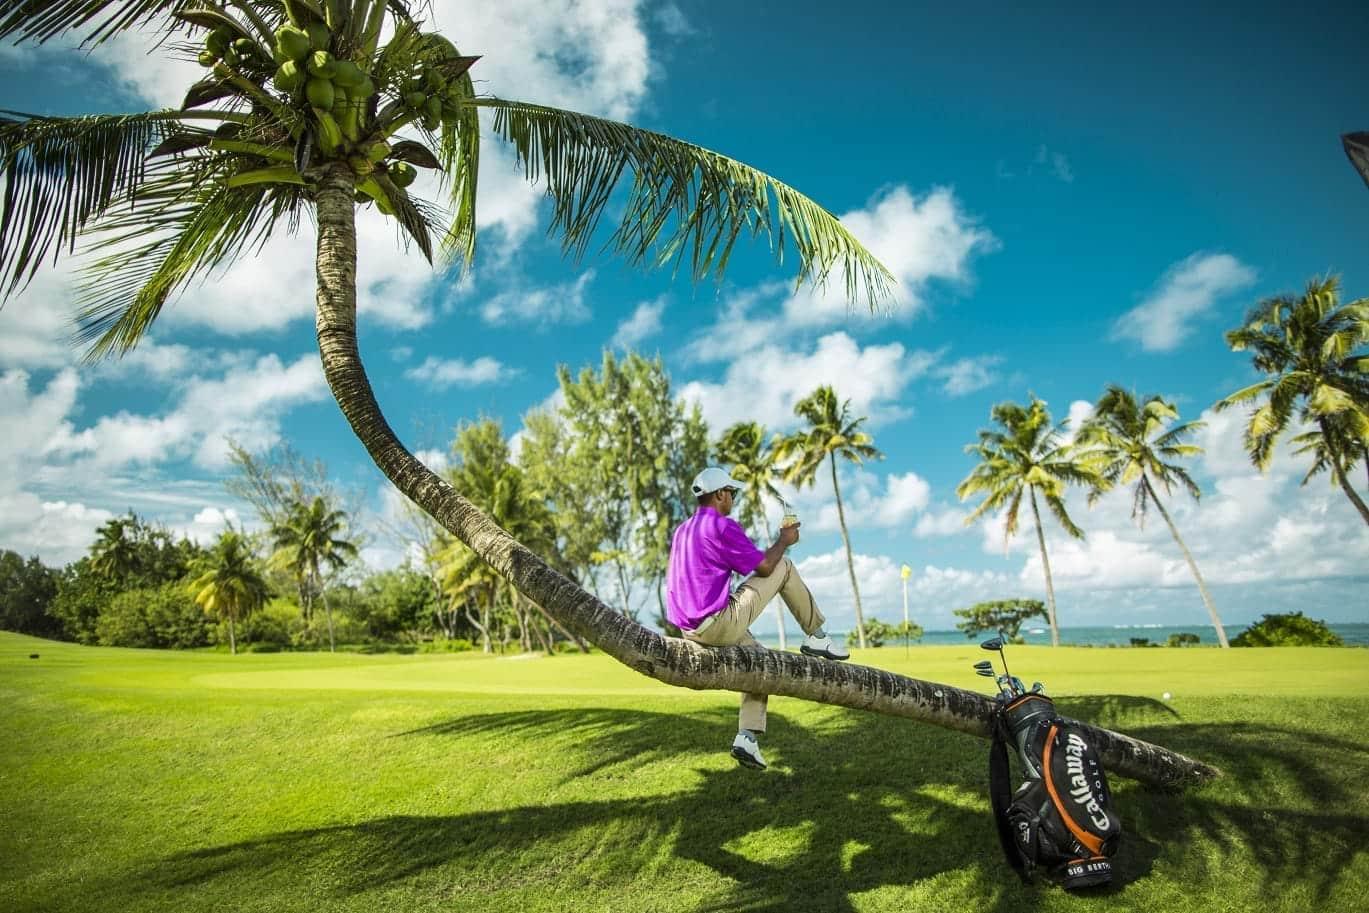 anahita golf goast mauritius